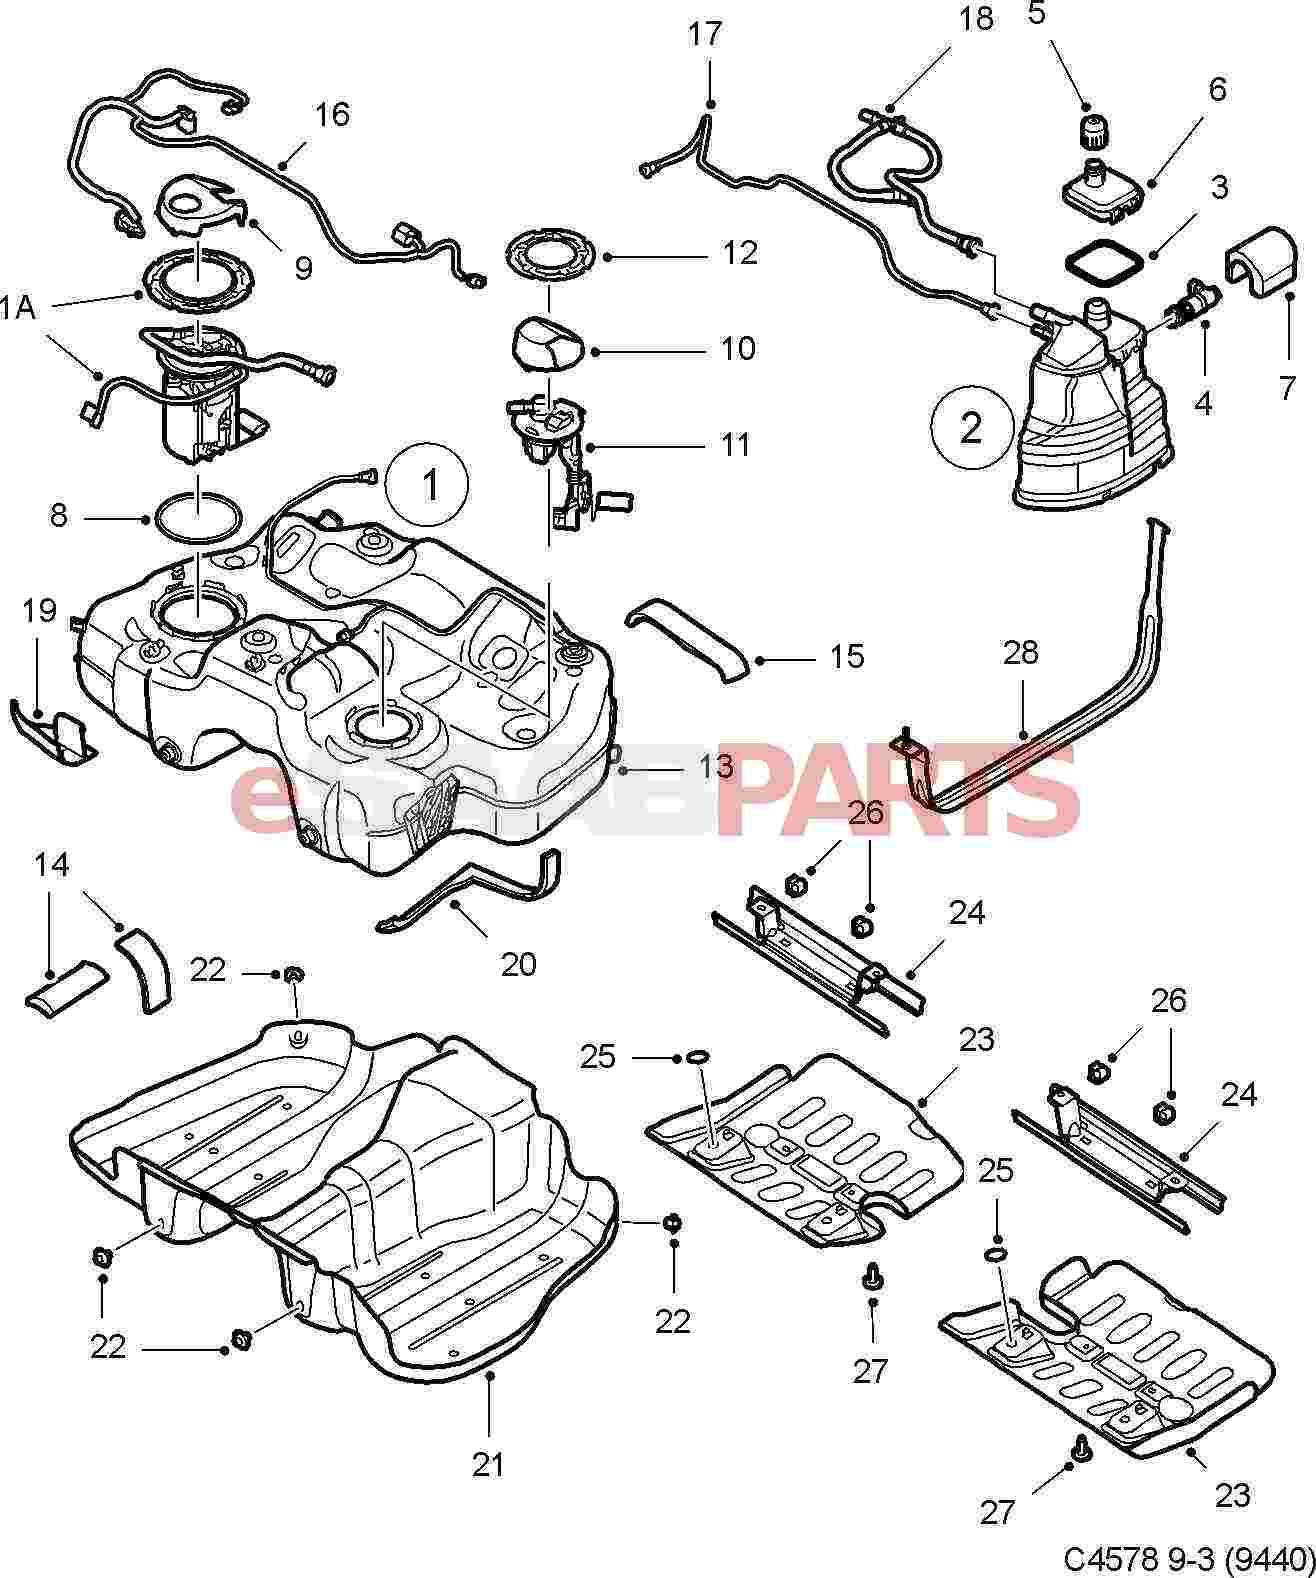 2008 saab 9 3 wiring diagram series 65 optical smoke detector 2003 convertible parts auto